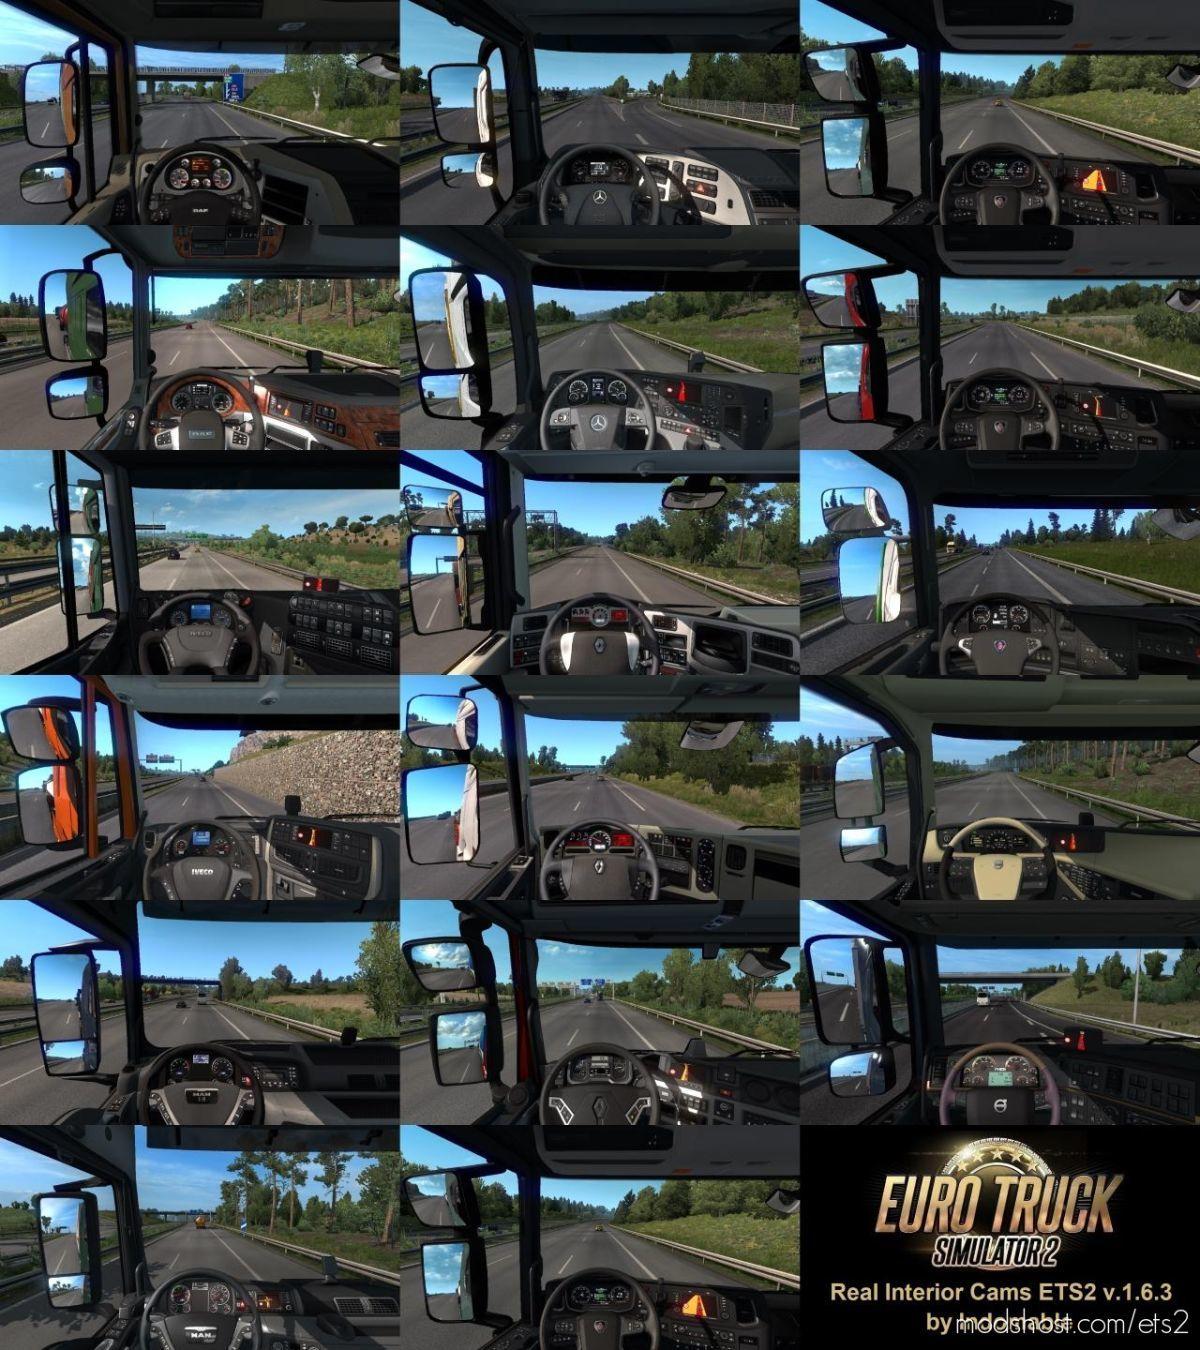 Real Interior Cams V1.6.3 for Euro Truck Simulator 2